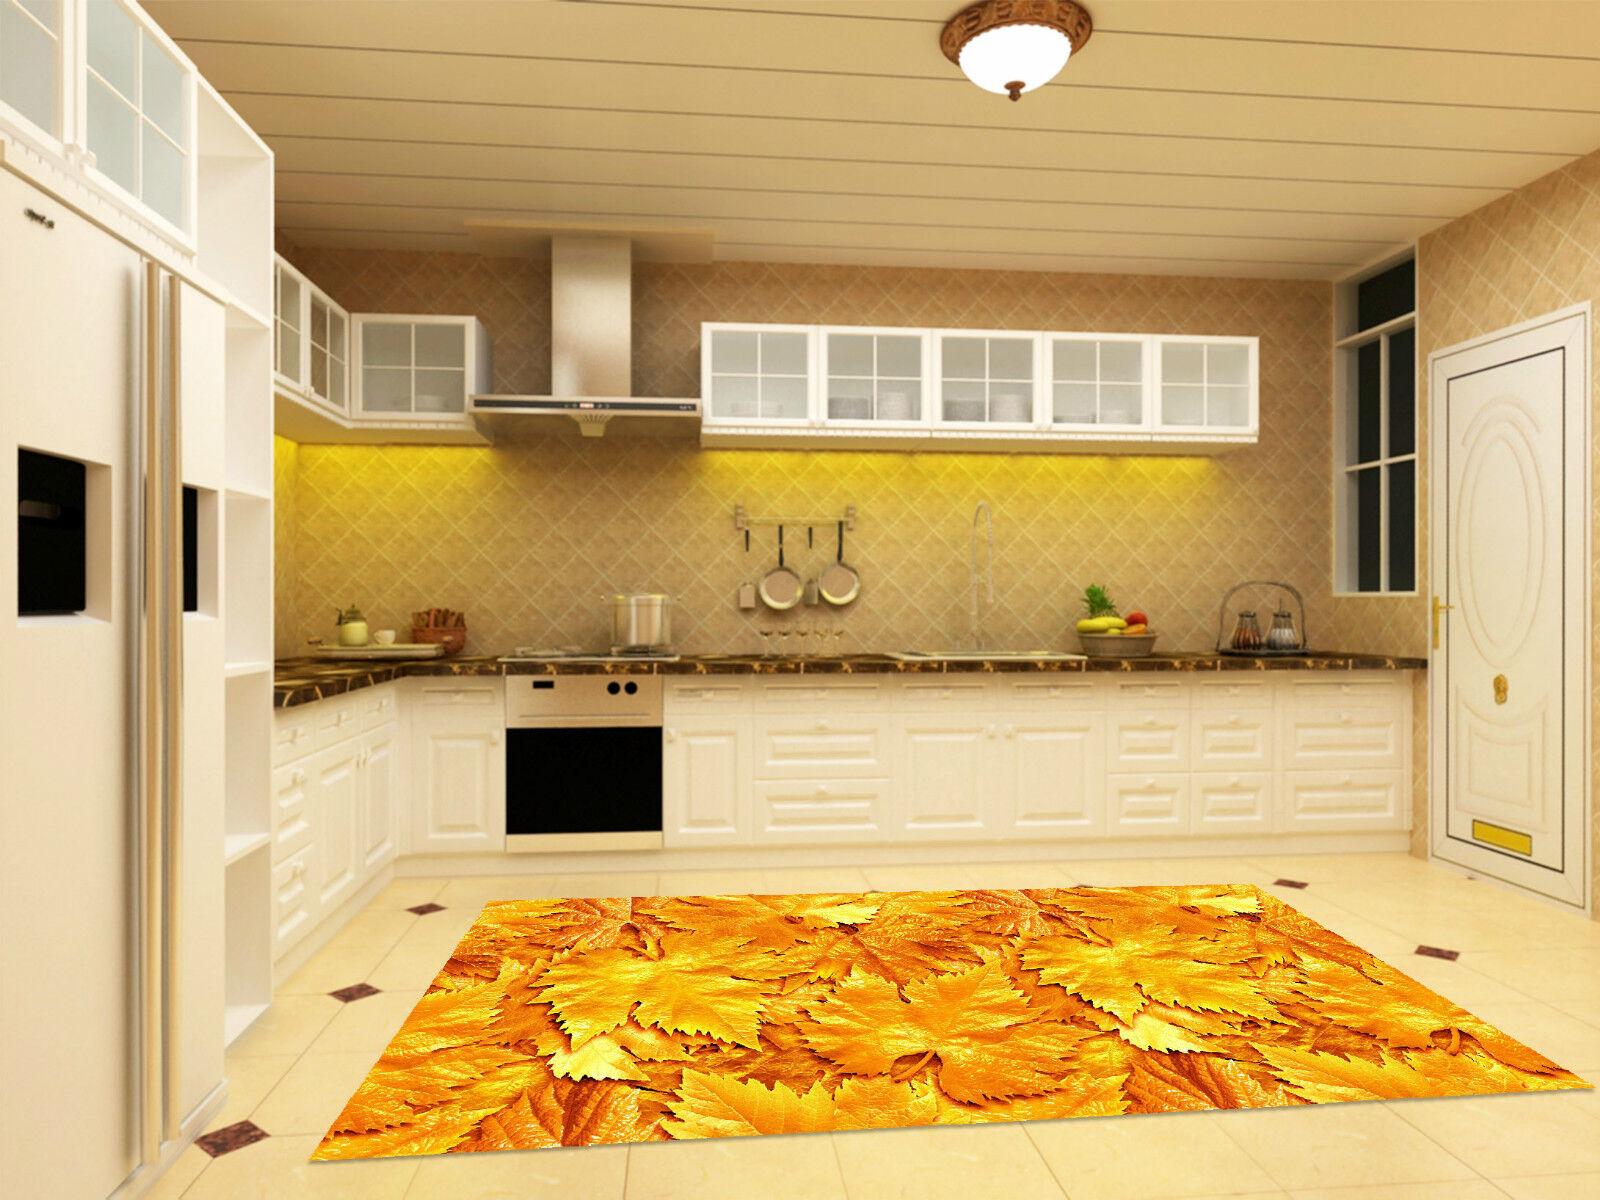 3D Feuille Lumineuse 096 De Décor Mural Murale De 096 Mur De Cuisine AJ WALLPAPER FR 05876c